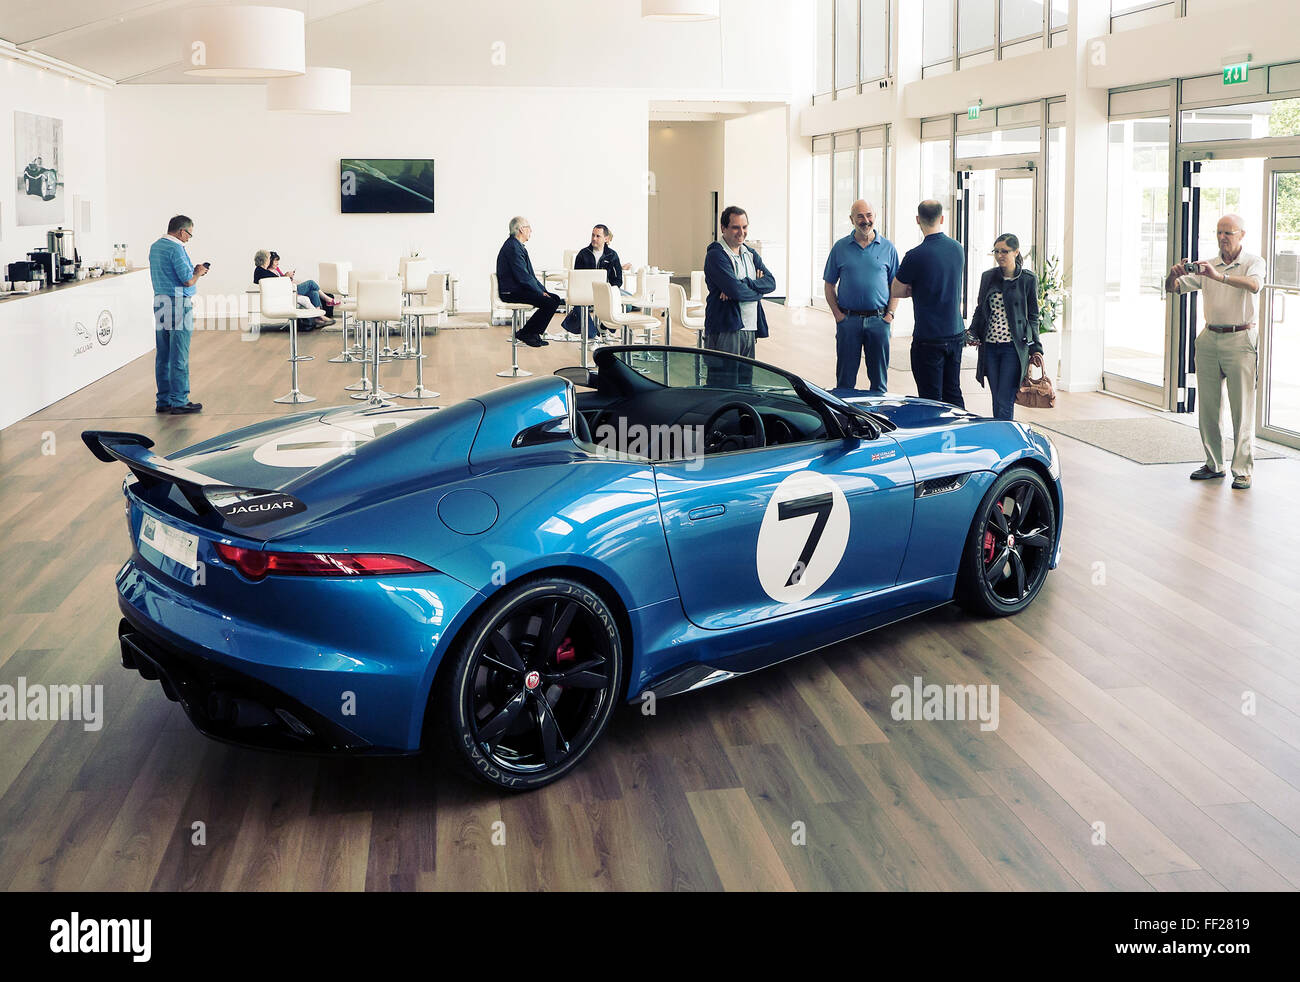 Jaguar Heritage Erfahrung. Jaguar-Projekt 7 auf dem Display in HQ Fen Ende Einfahr-und Prüfstrecke Stockbild